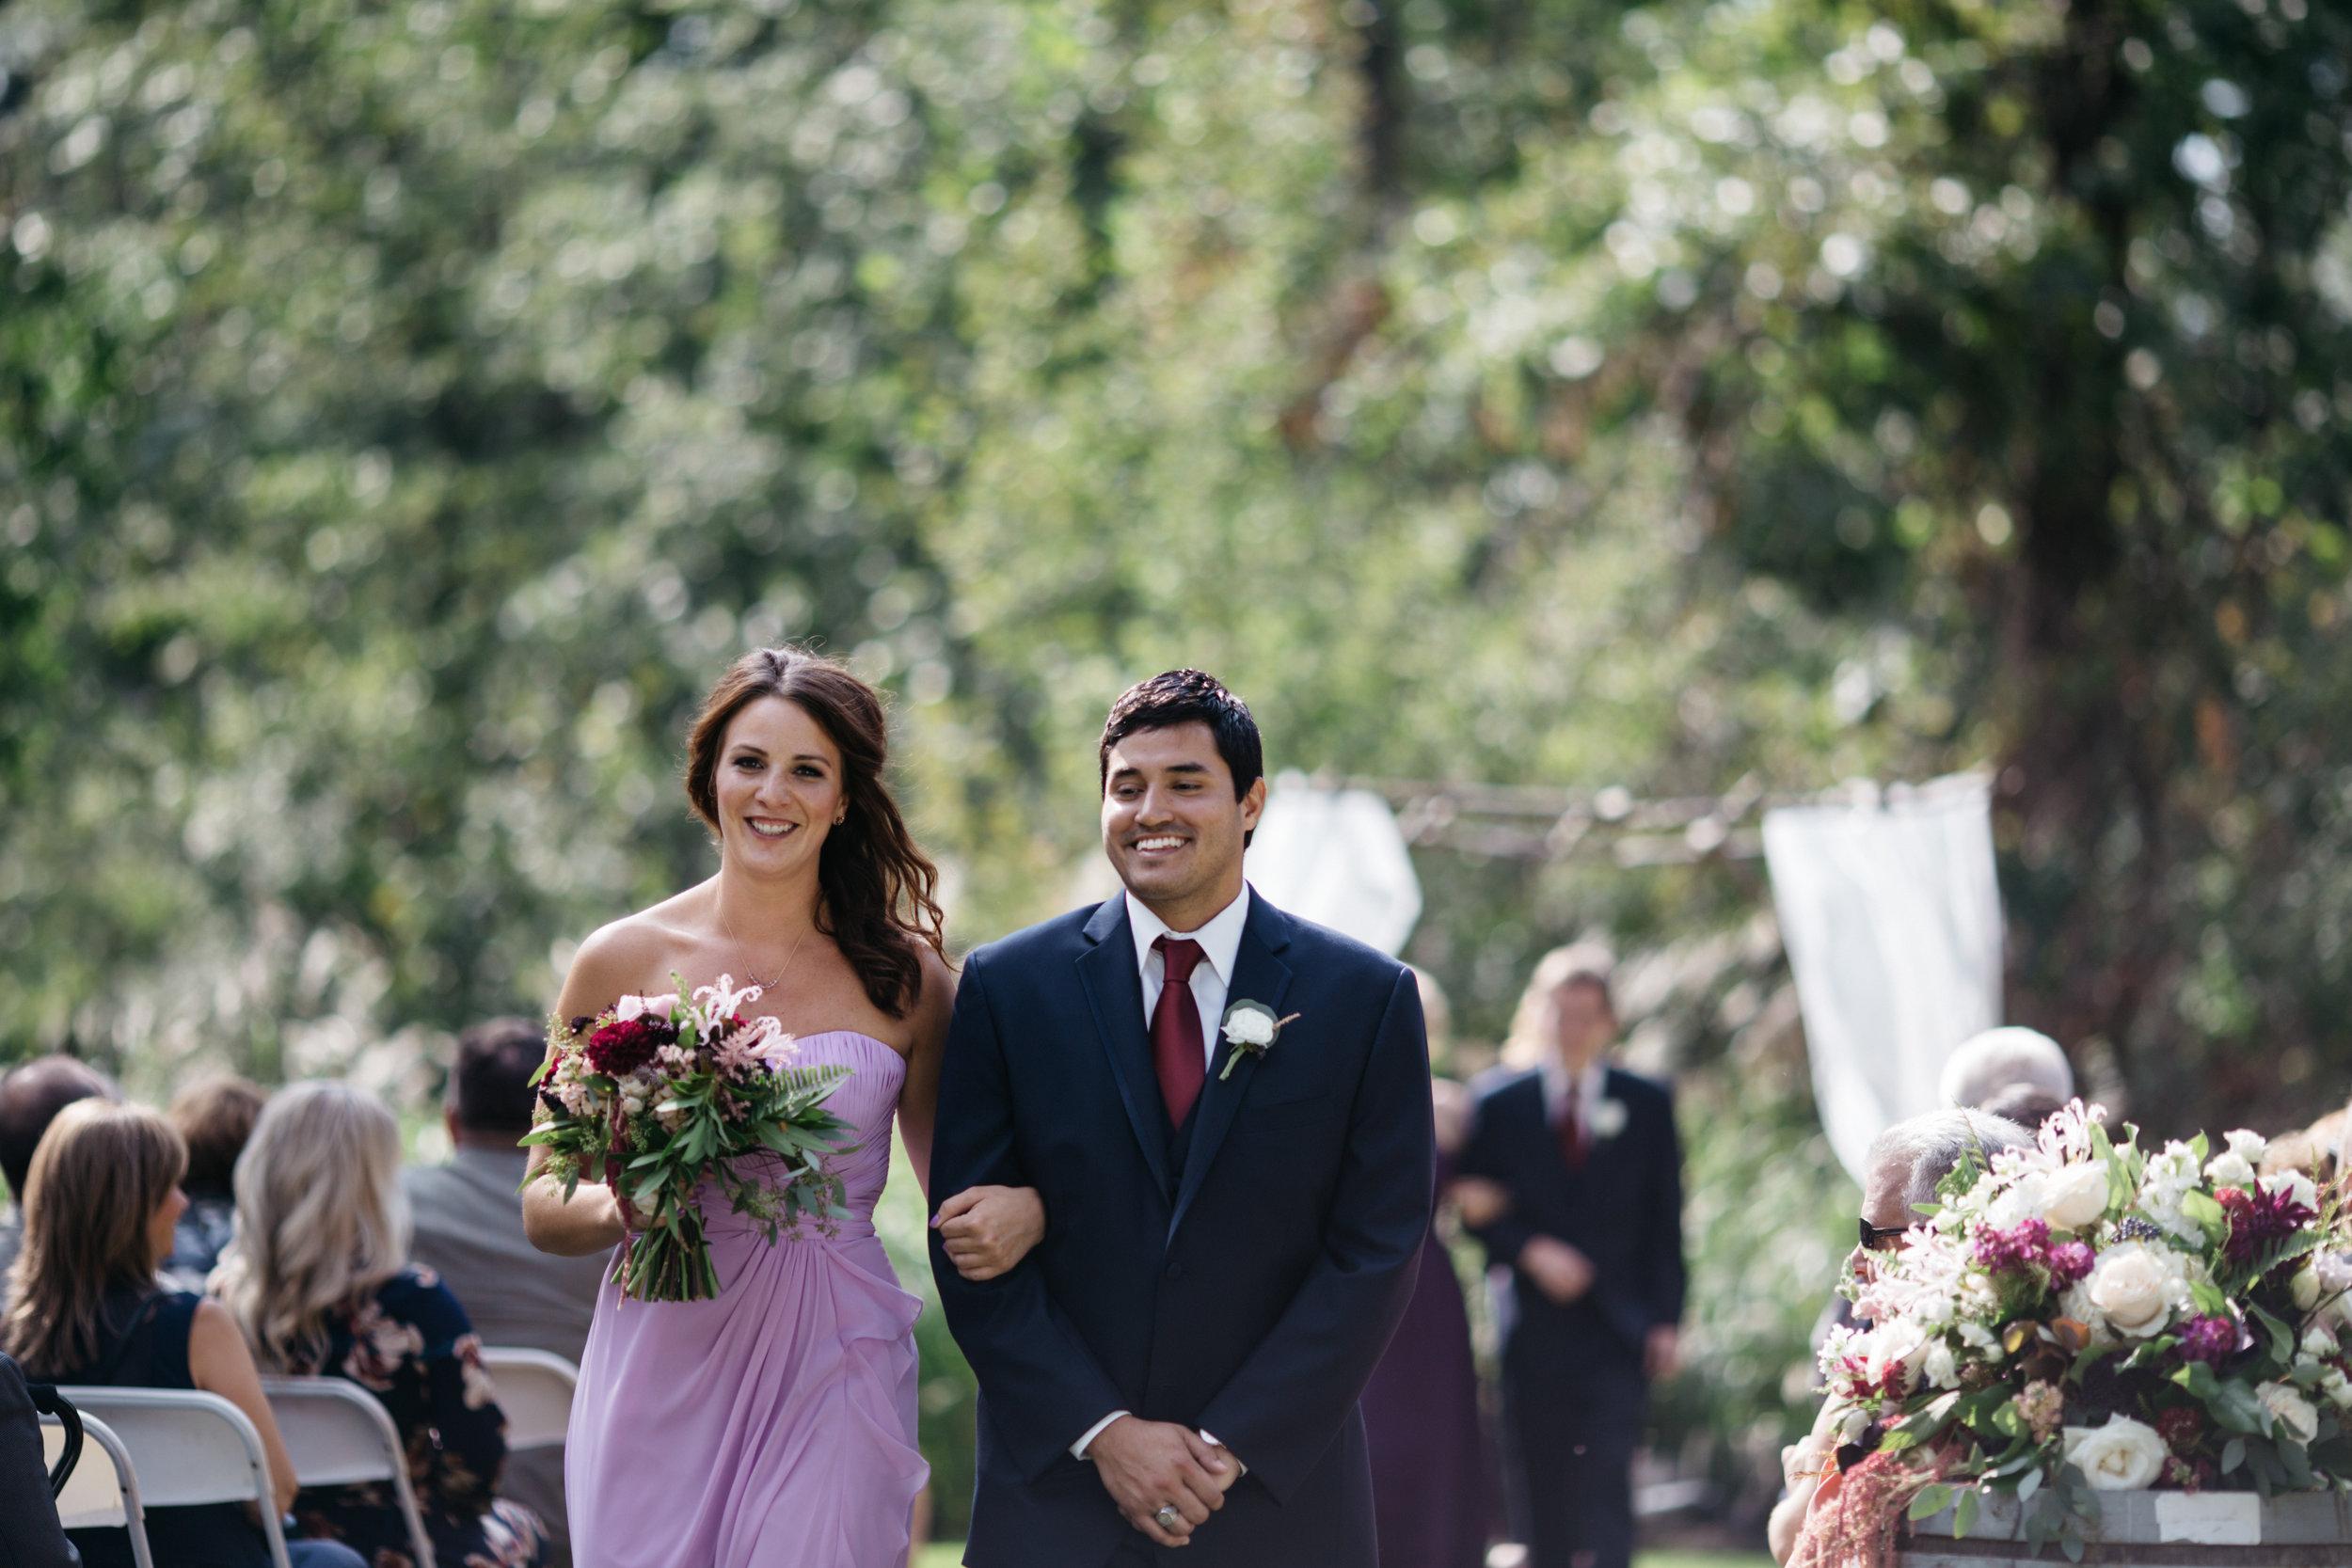 grandview-lodge-wedding-nisswa-minnesotagrandview-lodge-wedding-nisswa-minnesota